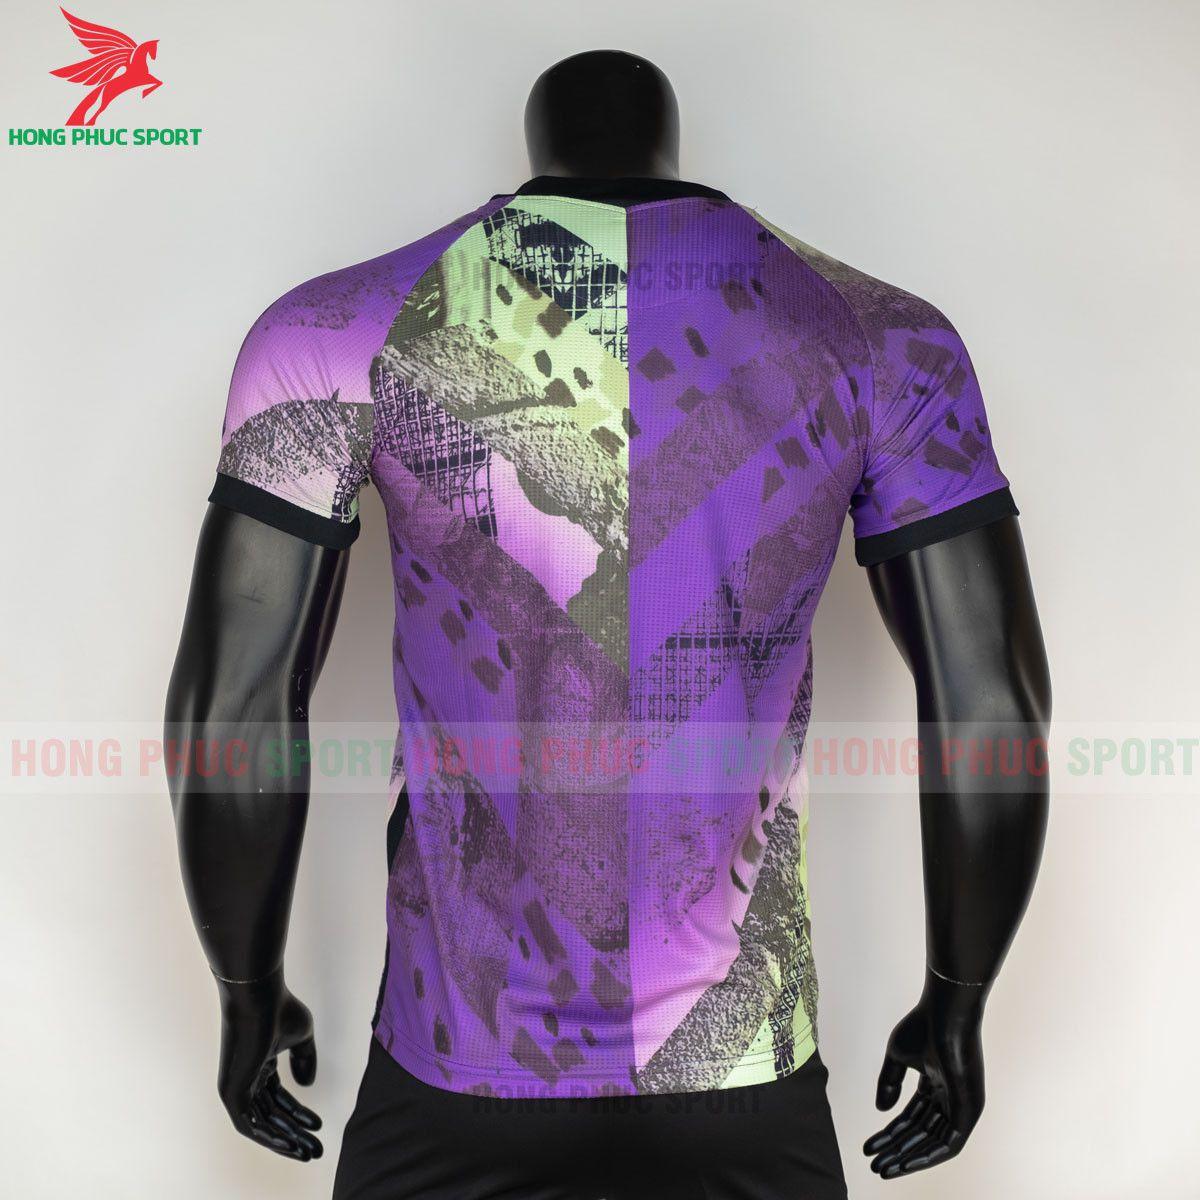 https://cdn.hongphucsport.com/unsafe/s4.shopbay.vn/files/285/ao-bong-da-tottenham-2021-2022-mau-thu-3-hang-thai-7-60d2fb10d1984.jpg